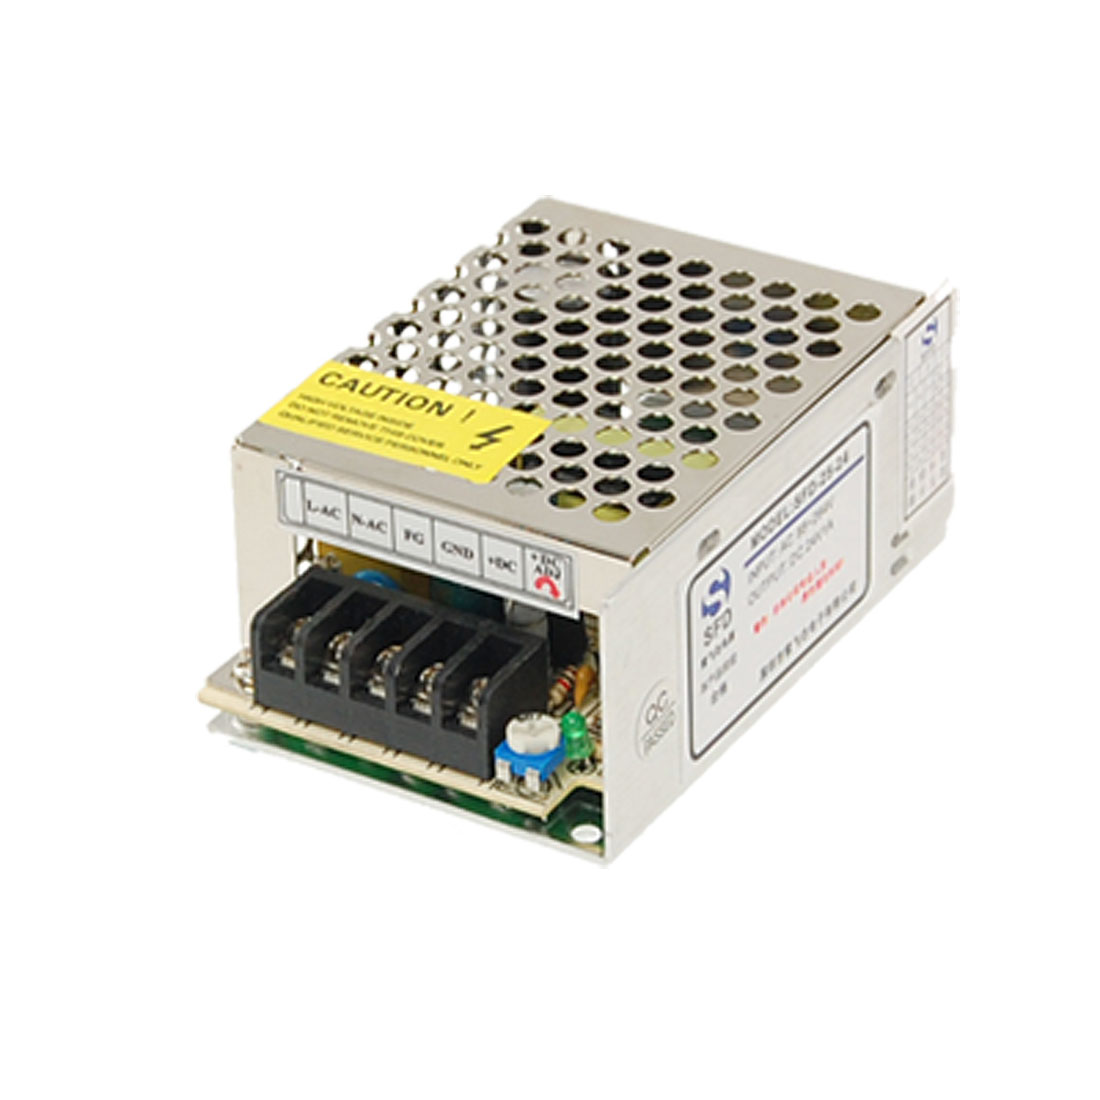 AC 110-220V DC 24V 1A 24W Single Output Power Switch Supply for LED Strip Light